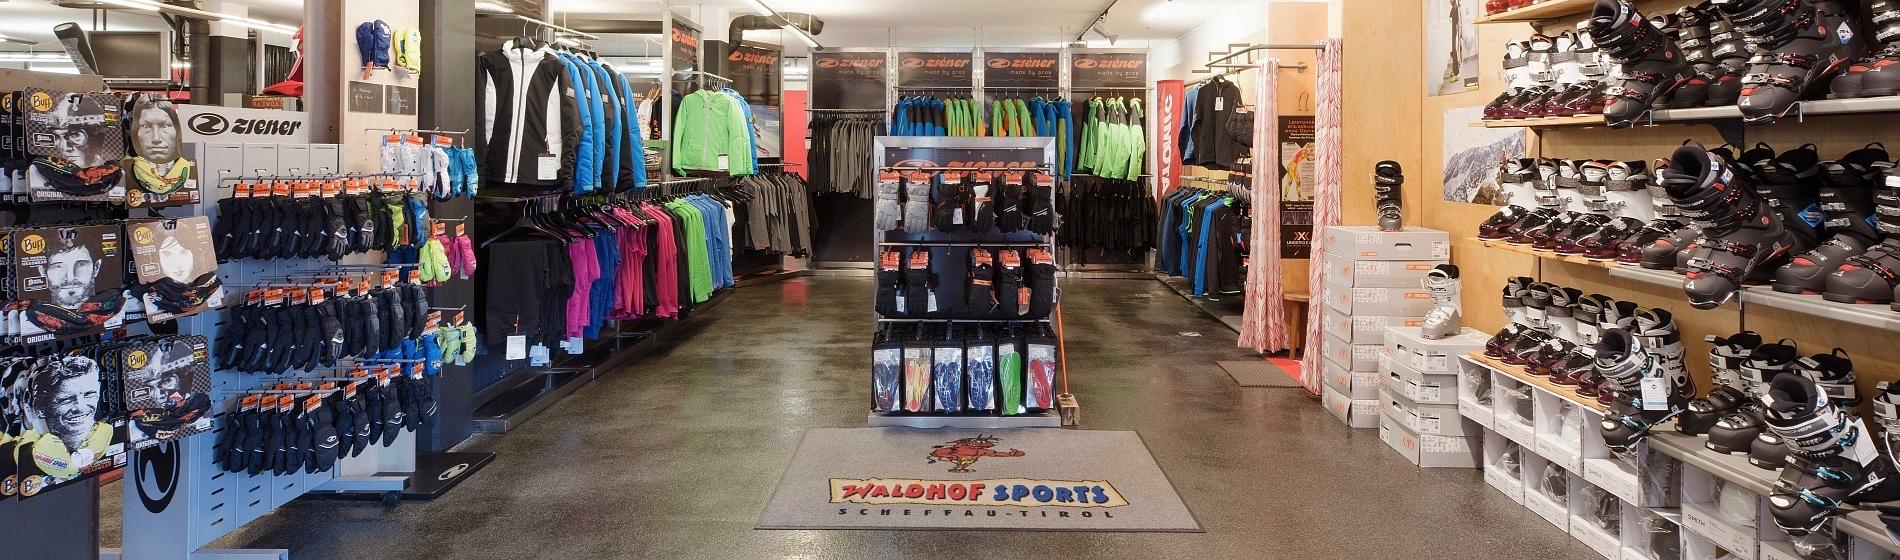 Waldhof Sports Skiverleih